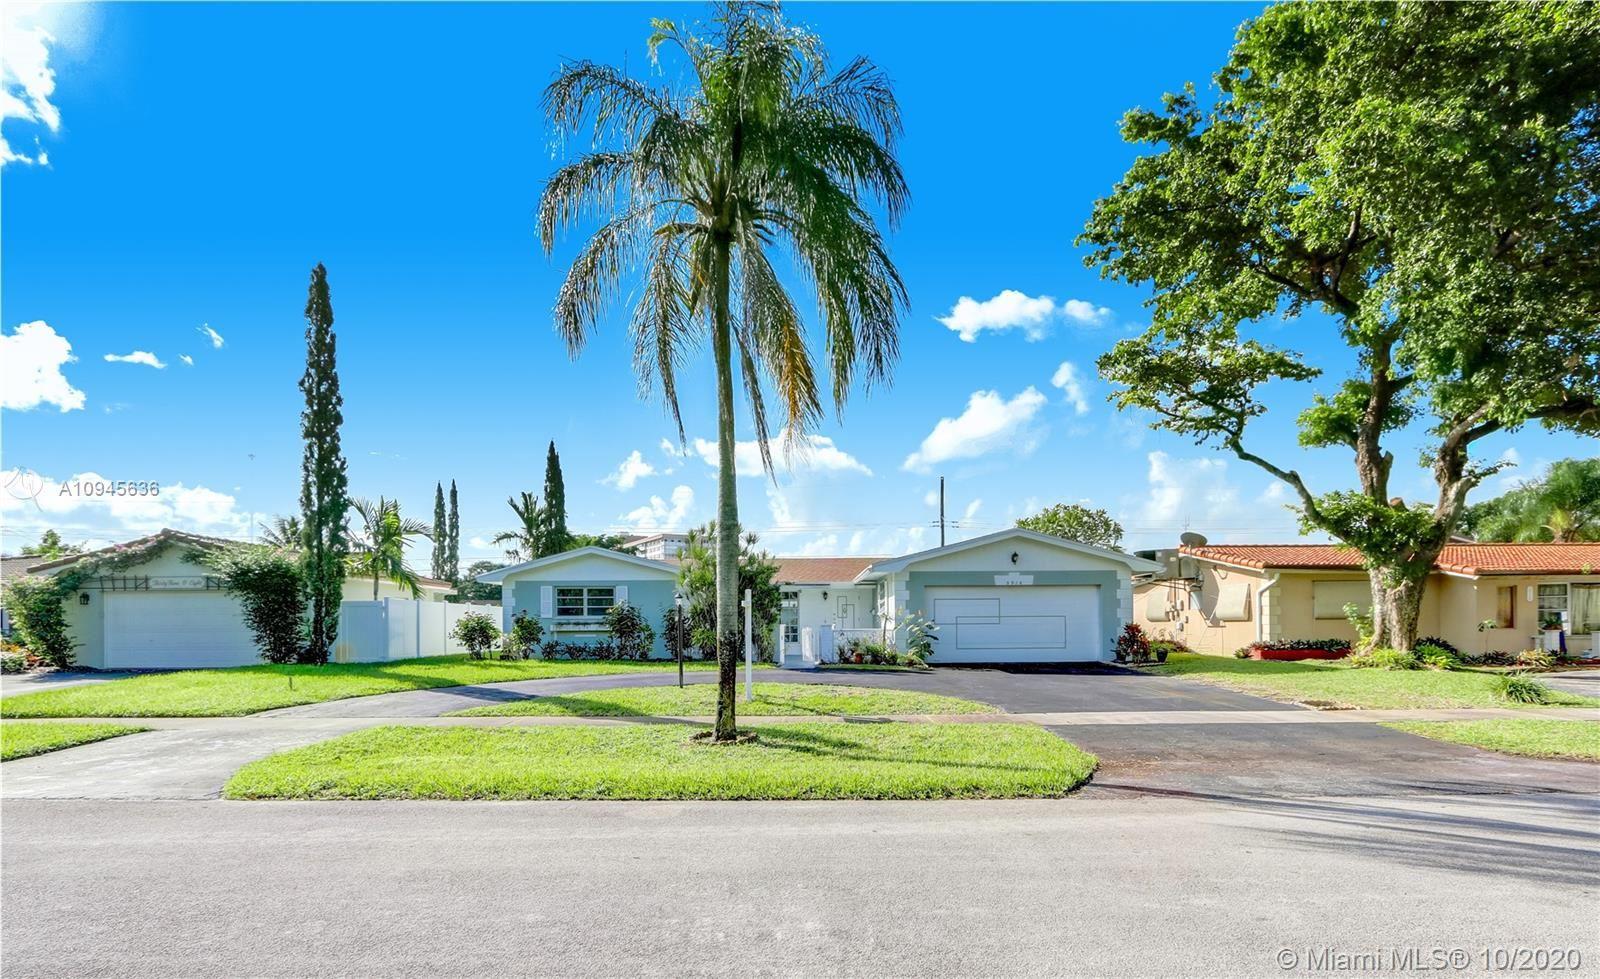 3916 Jefferson St, Hollywood, FL 33021 - #: A10945636